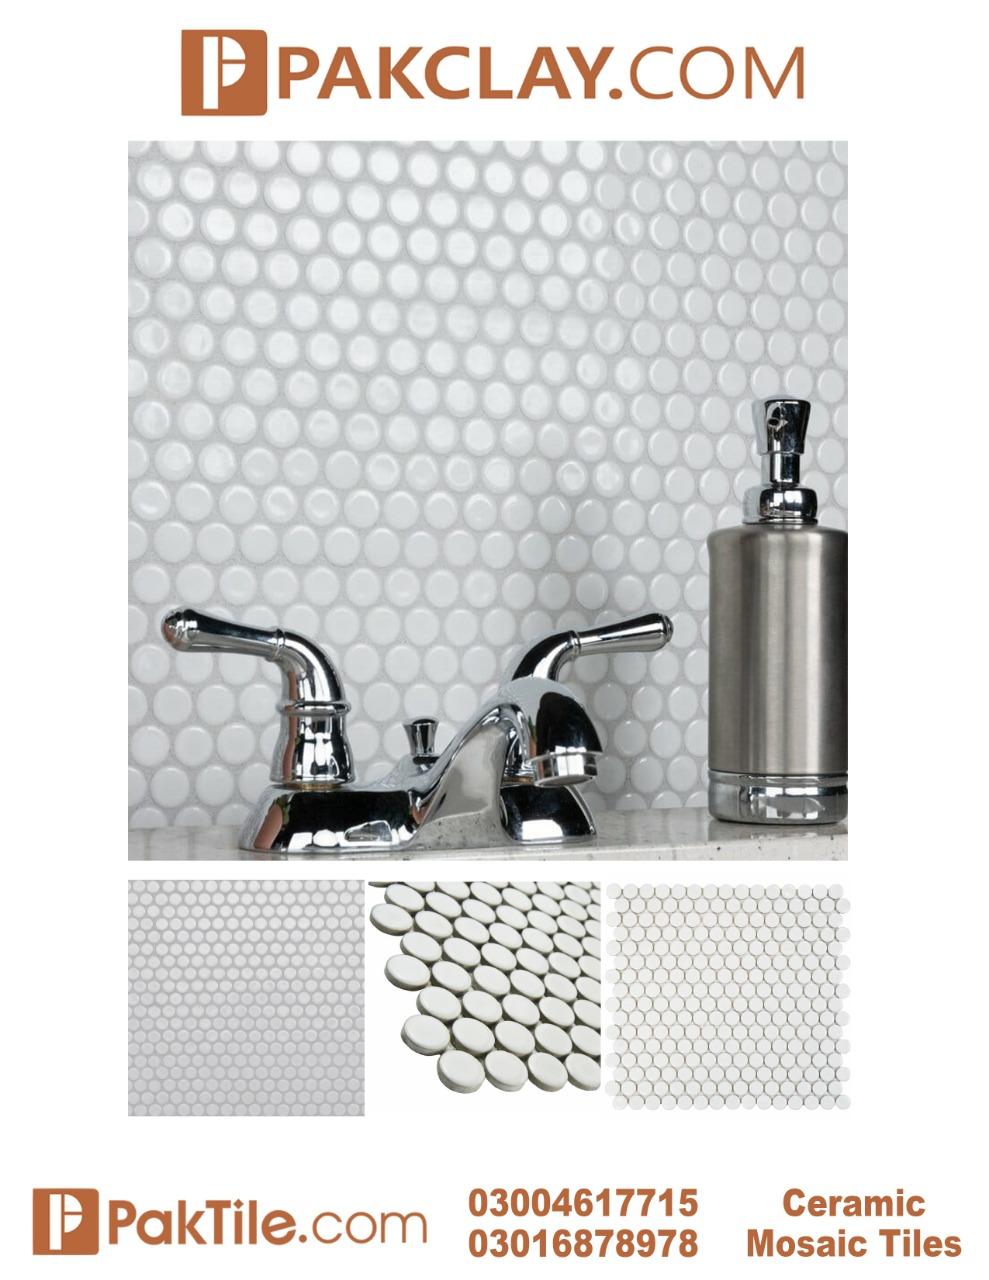 Bathroom Wall Cladding Tiles Price in Pakistan